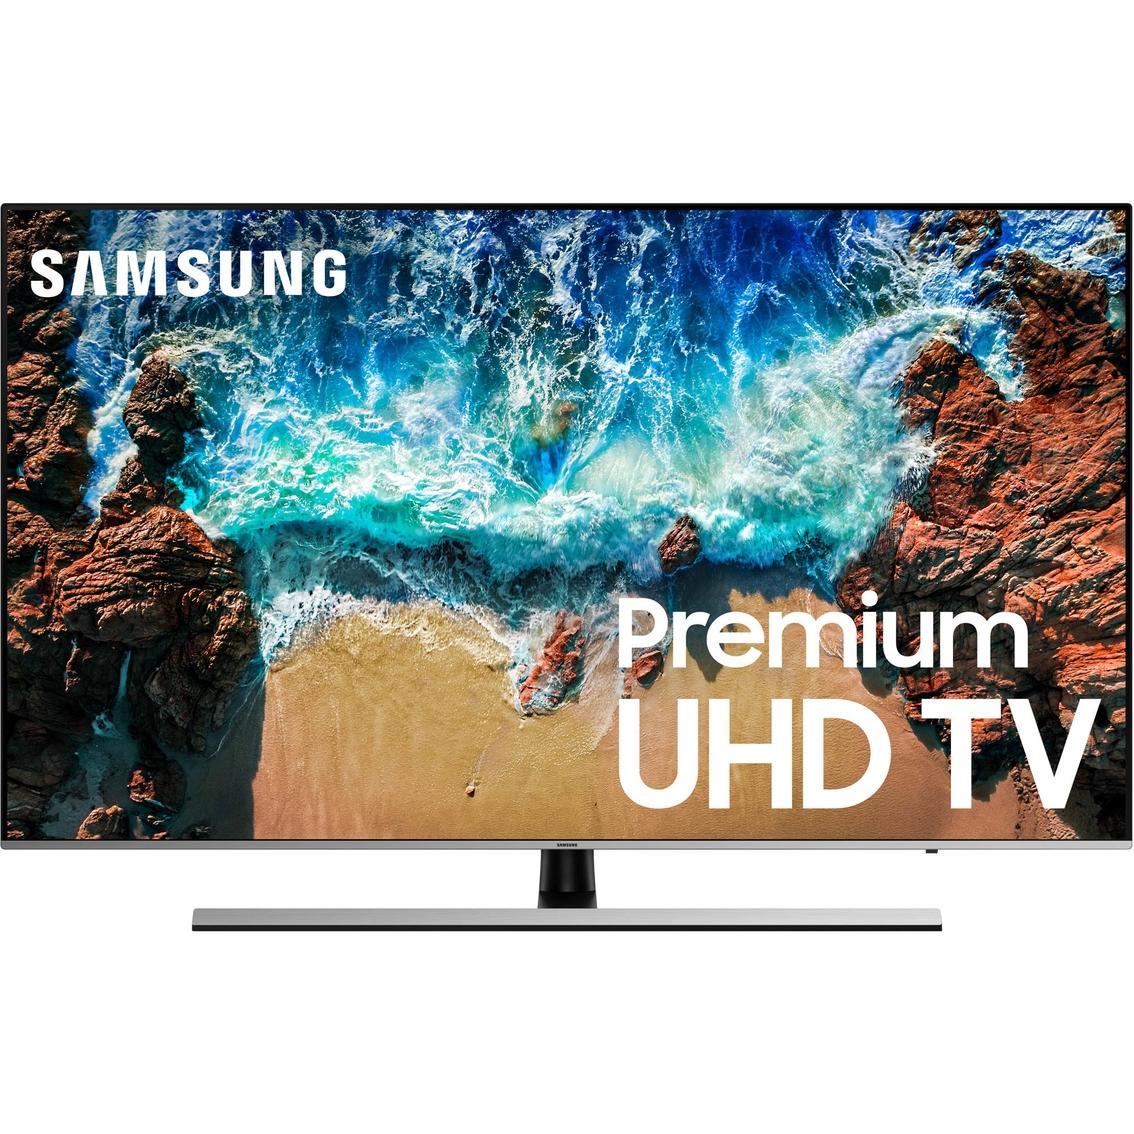 Samsung 82 In 4k Hdr 120hz Smart Tv Un82nu8000 Tvs Electronics Lionel Trains Supero Remote Control Switches No 112